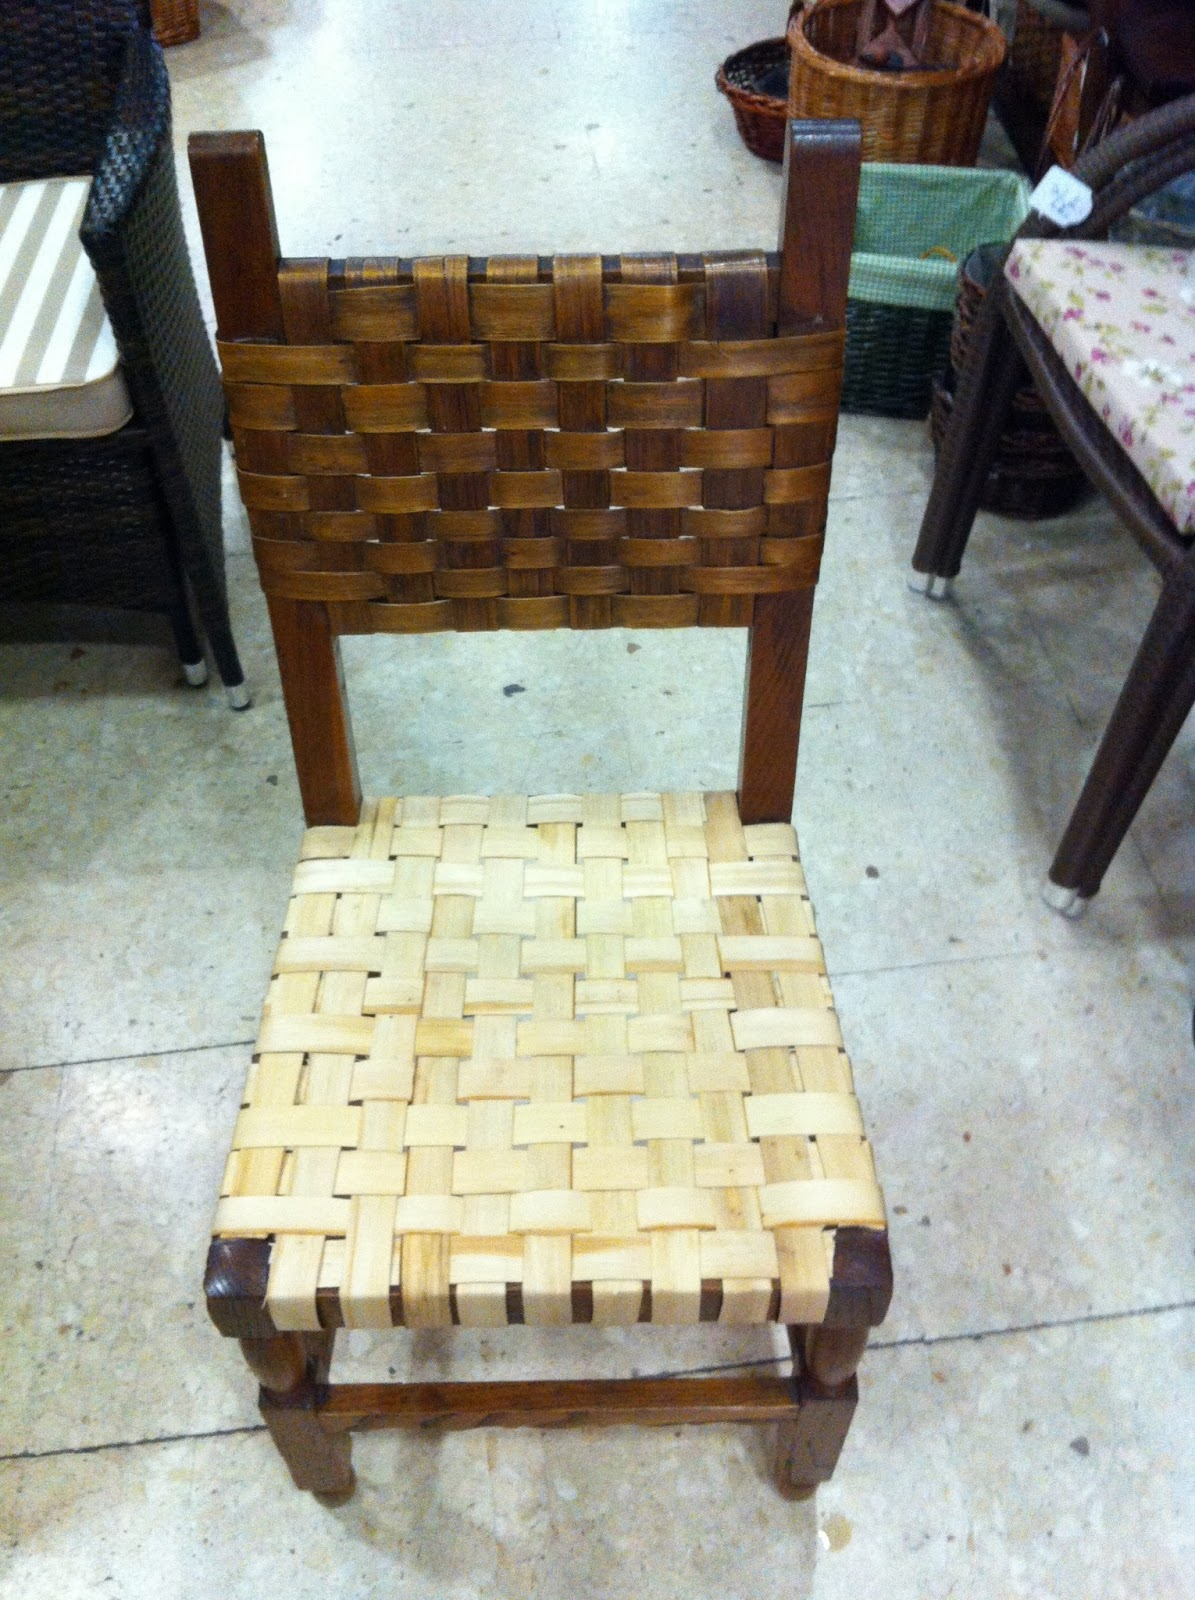 Restauraci n sillas rejilla enea anea mimbre silla - Reparacion de sillas de rejilla ...